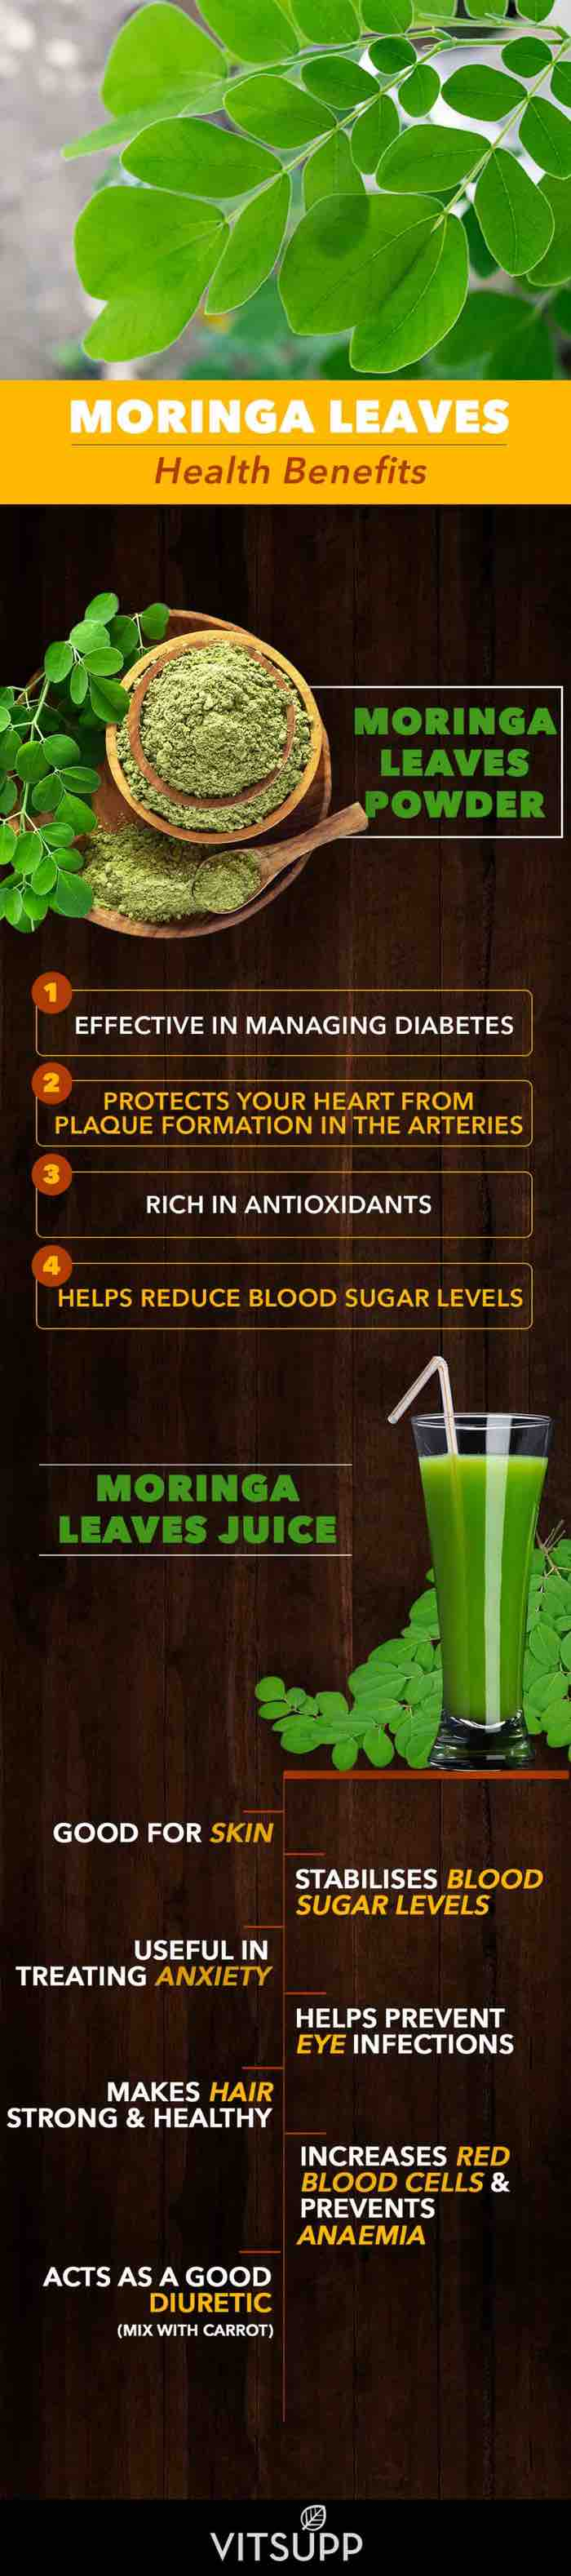 Drumstick Leaves Flowers Seeds Health Benefits And Side Effects Moringa Benefits Moringa Powder Moringa Leaves